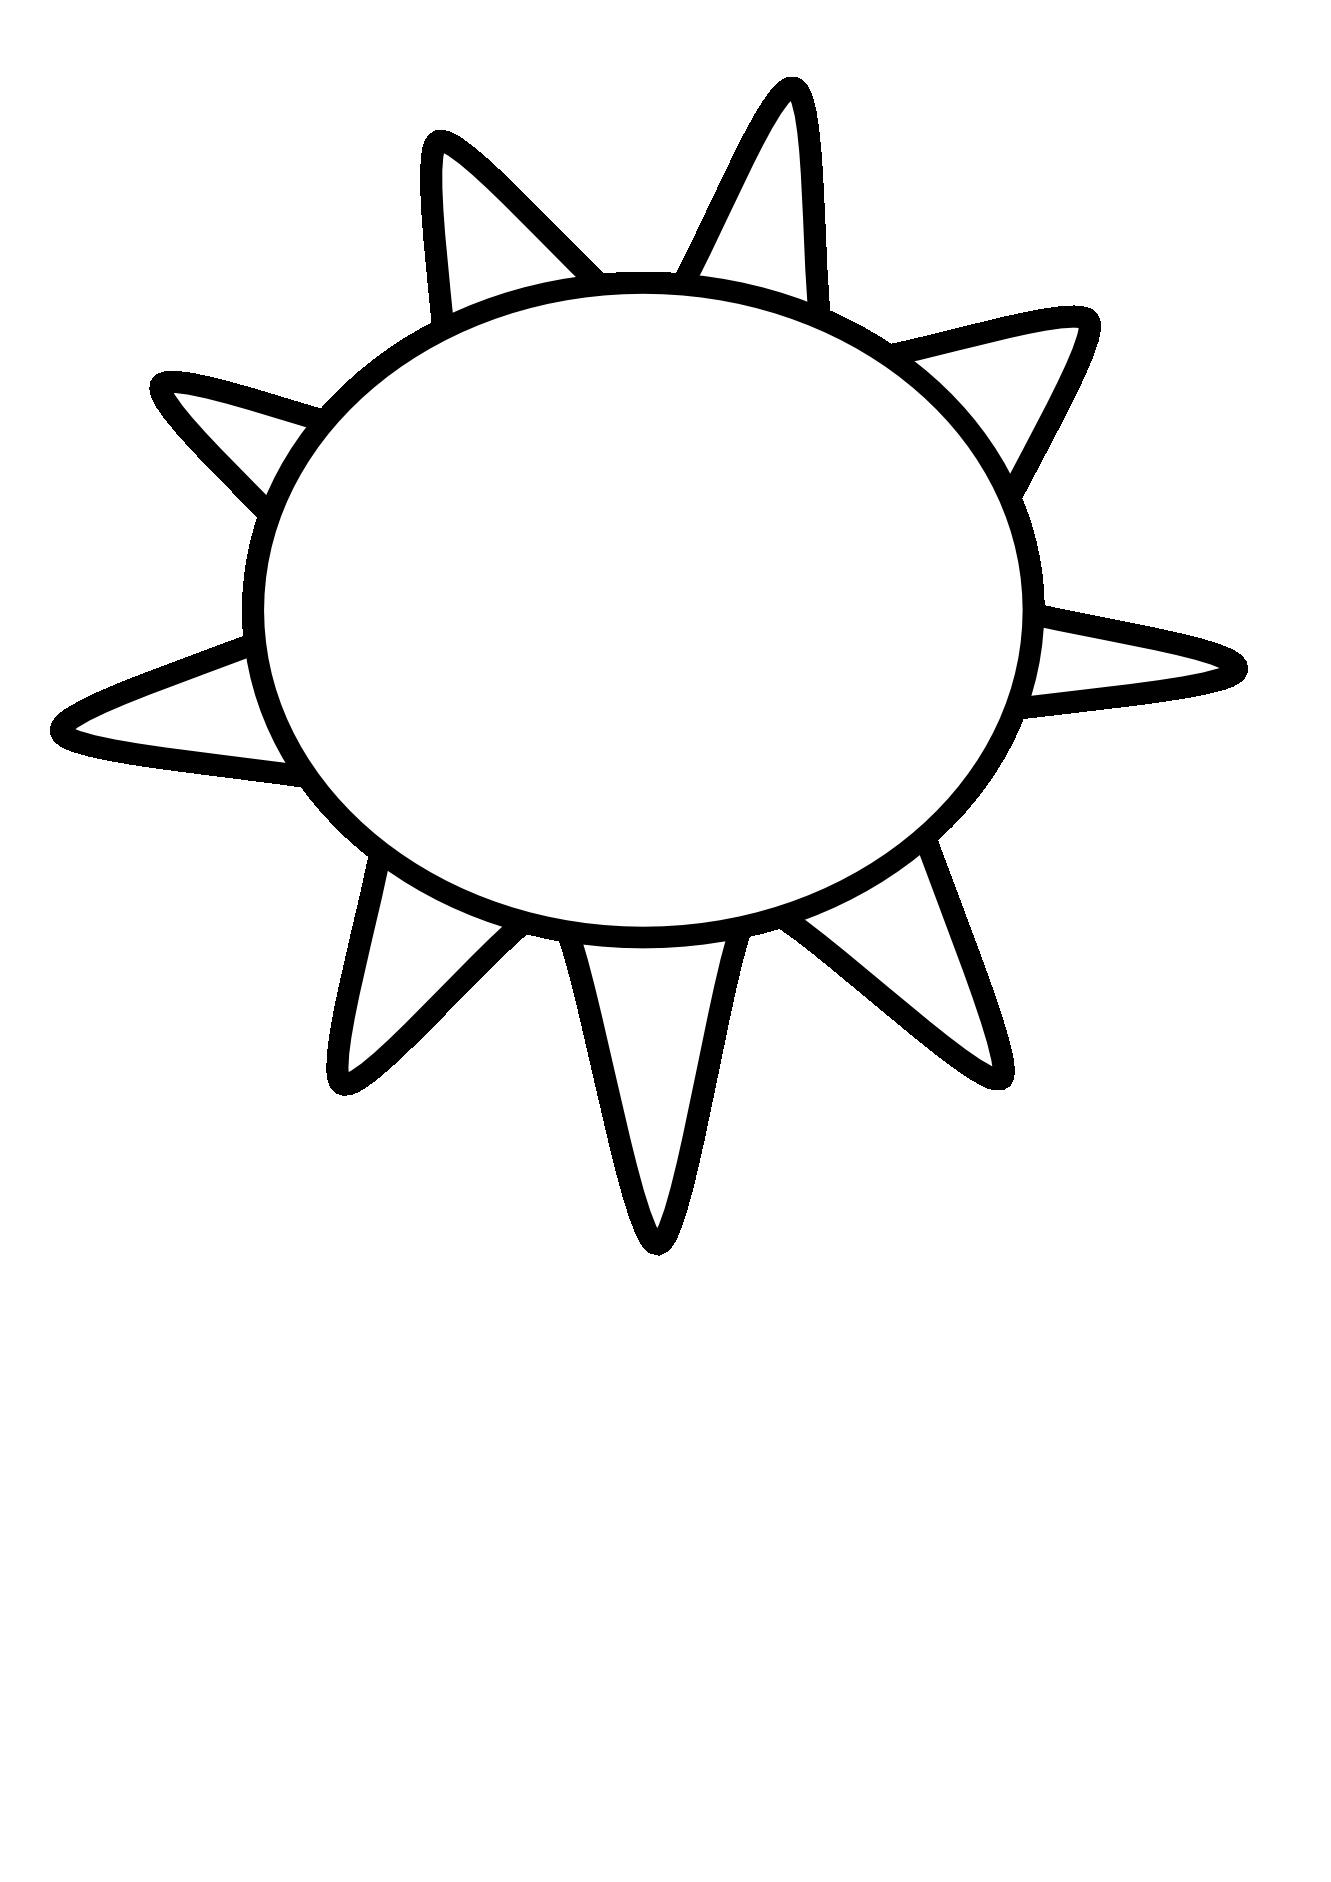 Florida clipart sun. Outline panda free images